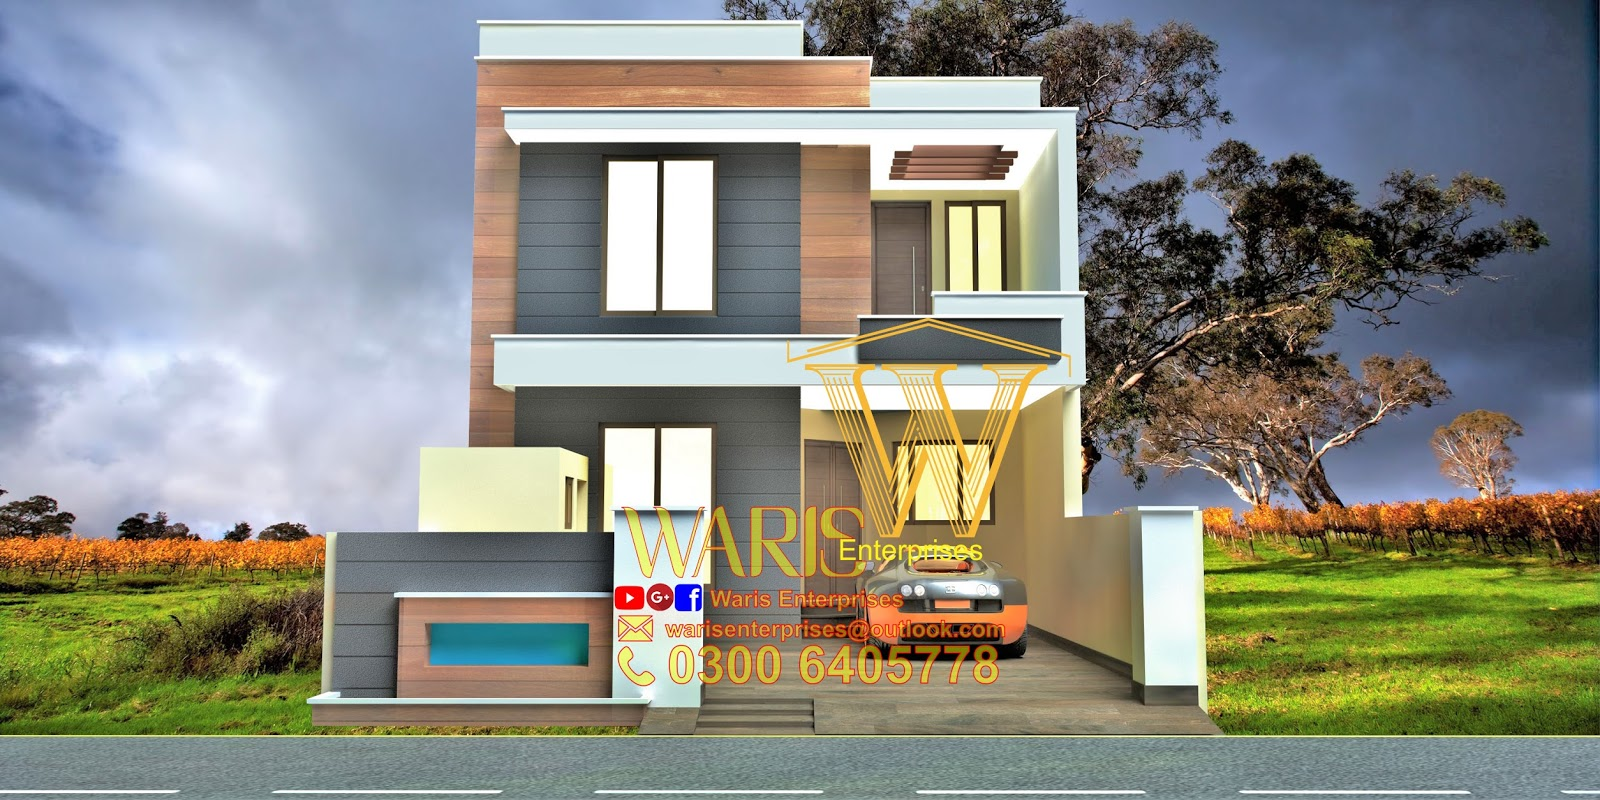 5 marla house designs in pakistan i waris enterprises for 8 marla home designs